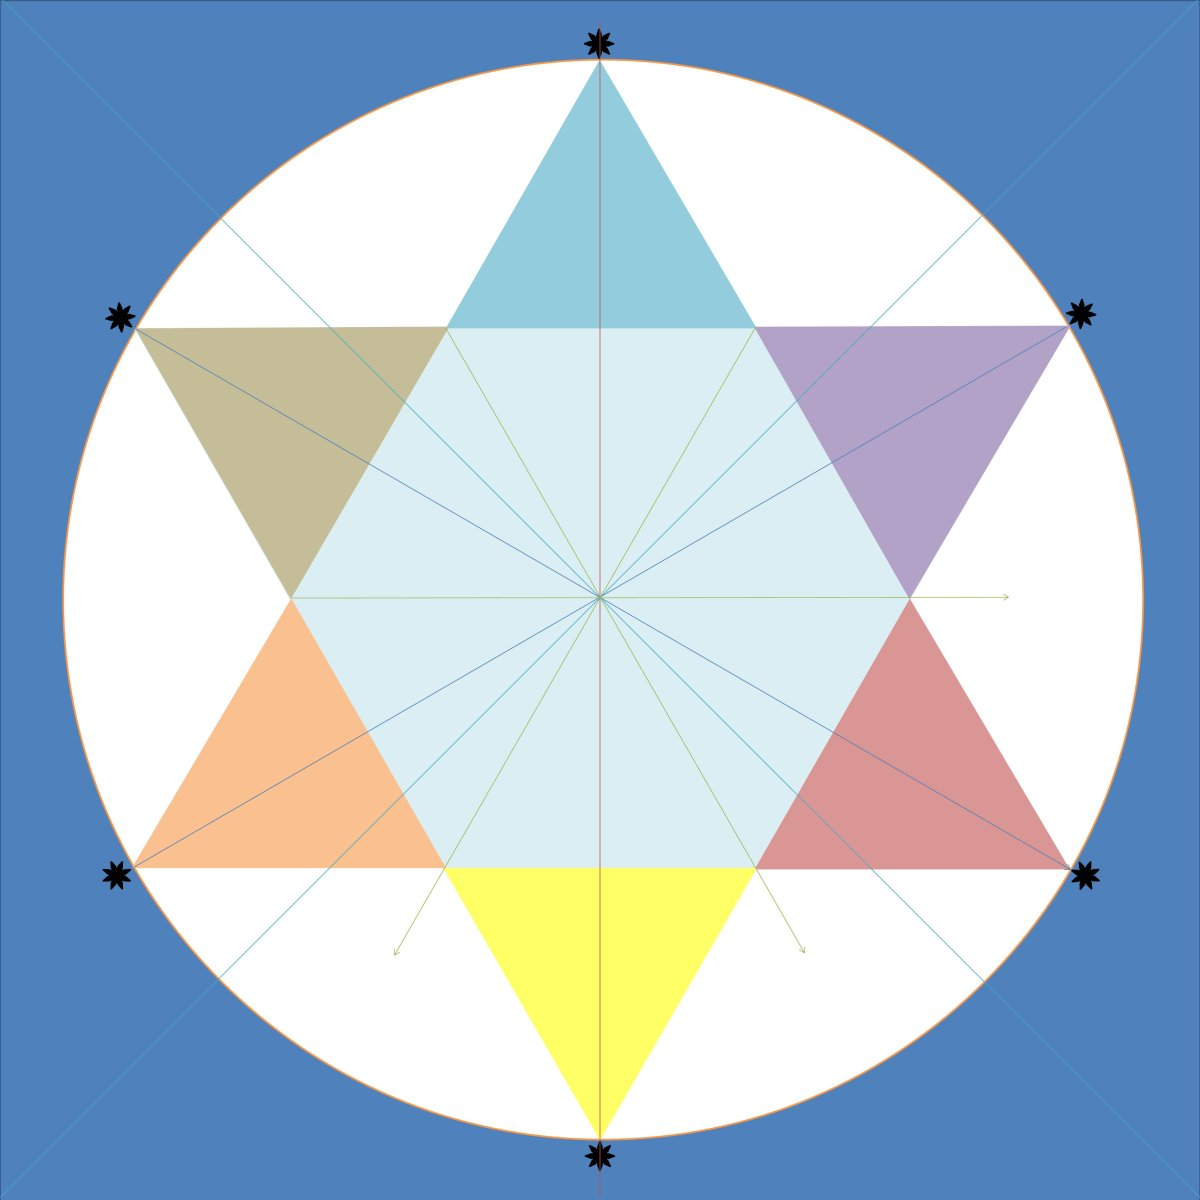 Figure 3 - Six-point star